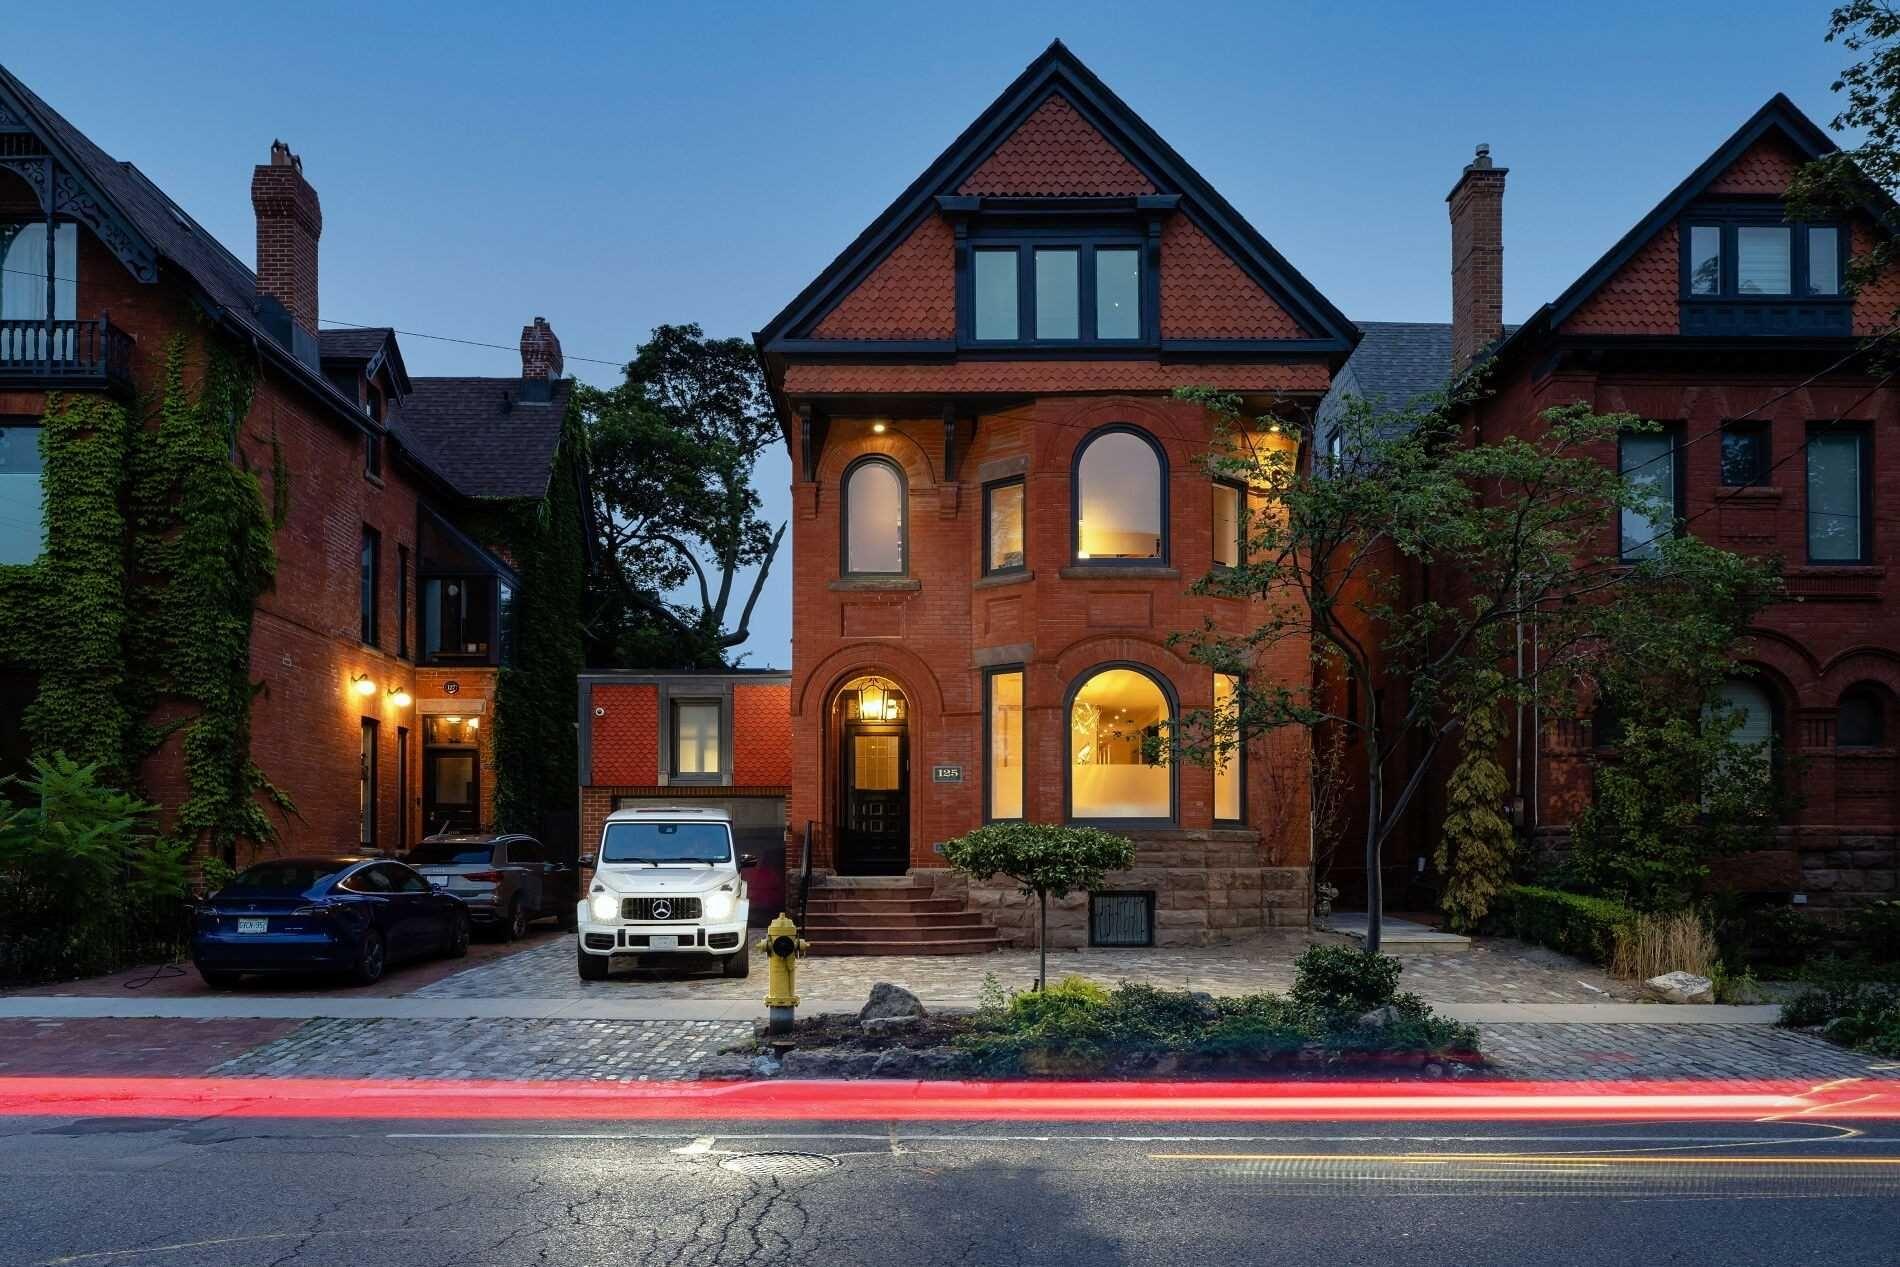 Main Photo: 125 Bedford Road in Toronto: Annex House (3-Storey) for sale (Toronto C02)  : MLS®# C5377035